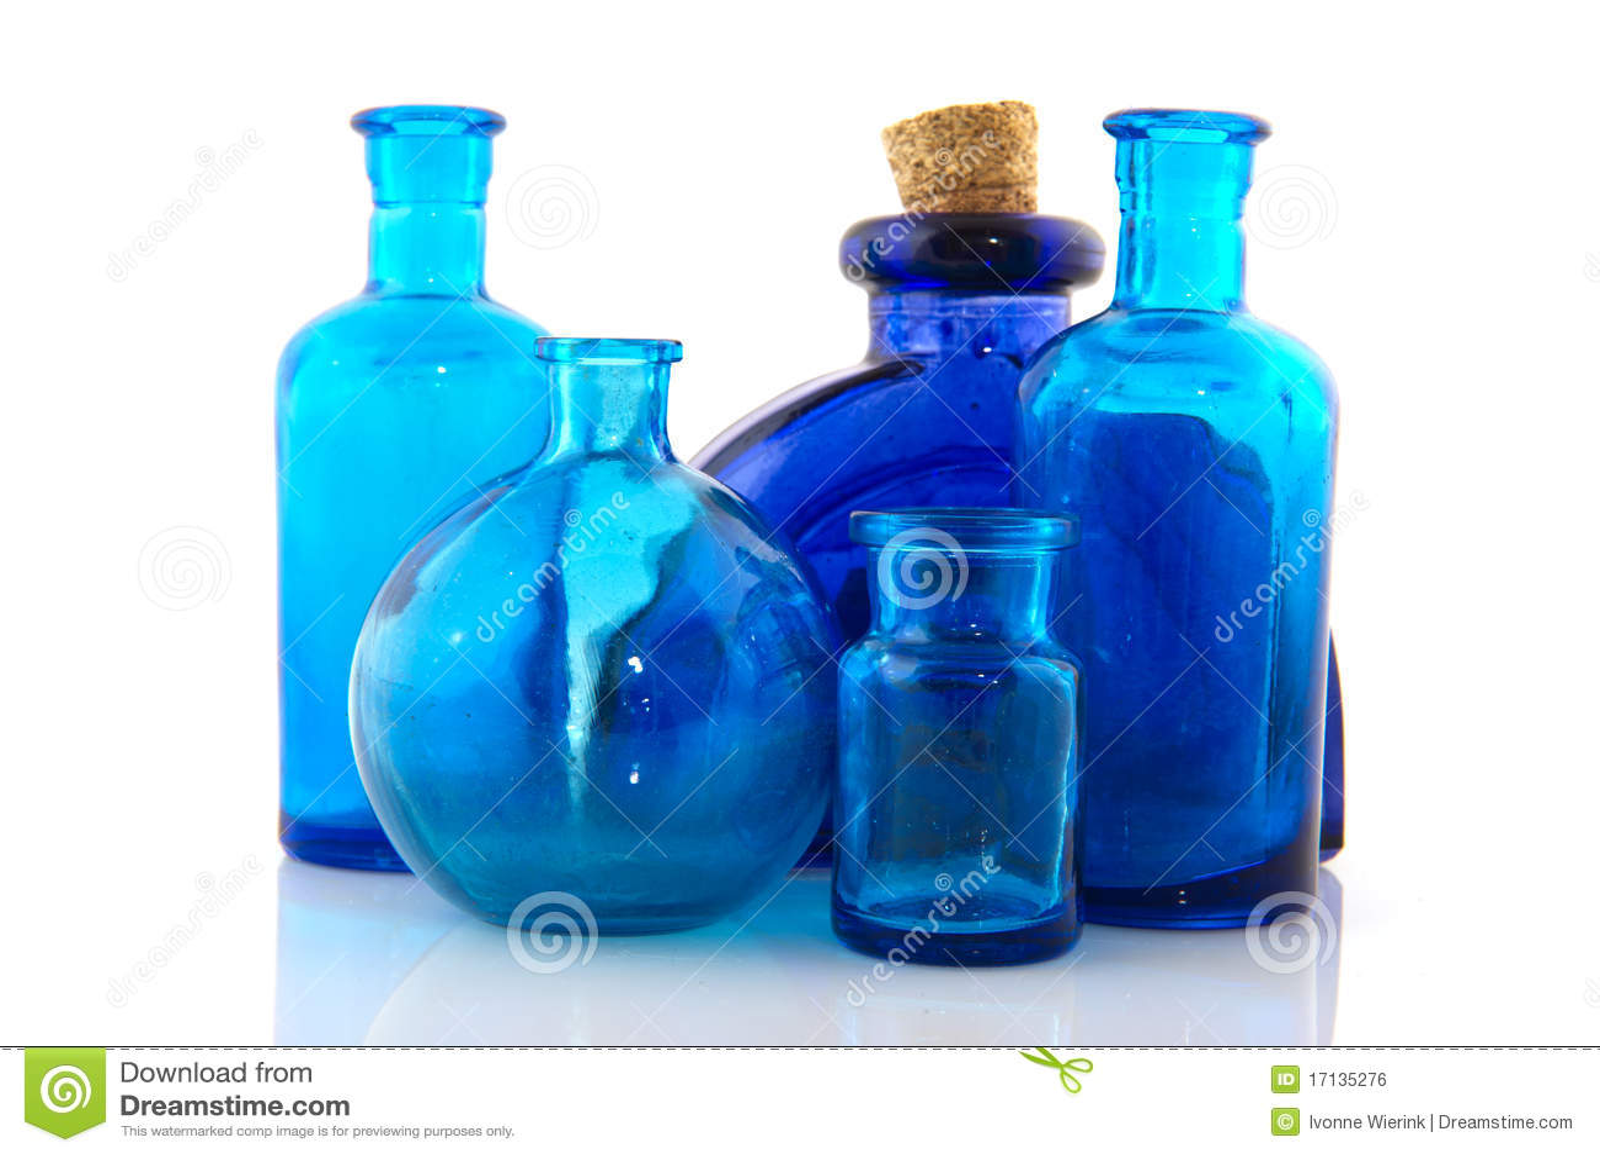 objets en verre bleus photo stock image du dur e ligne 17135276. Black Bedroom Furniture Sets. Home Design Ideas